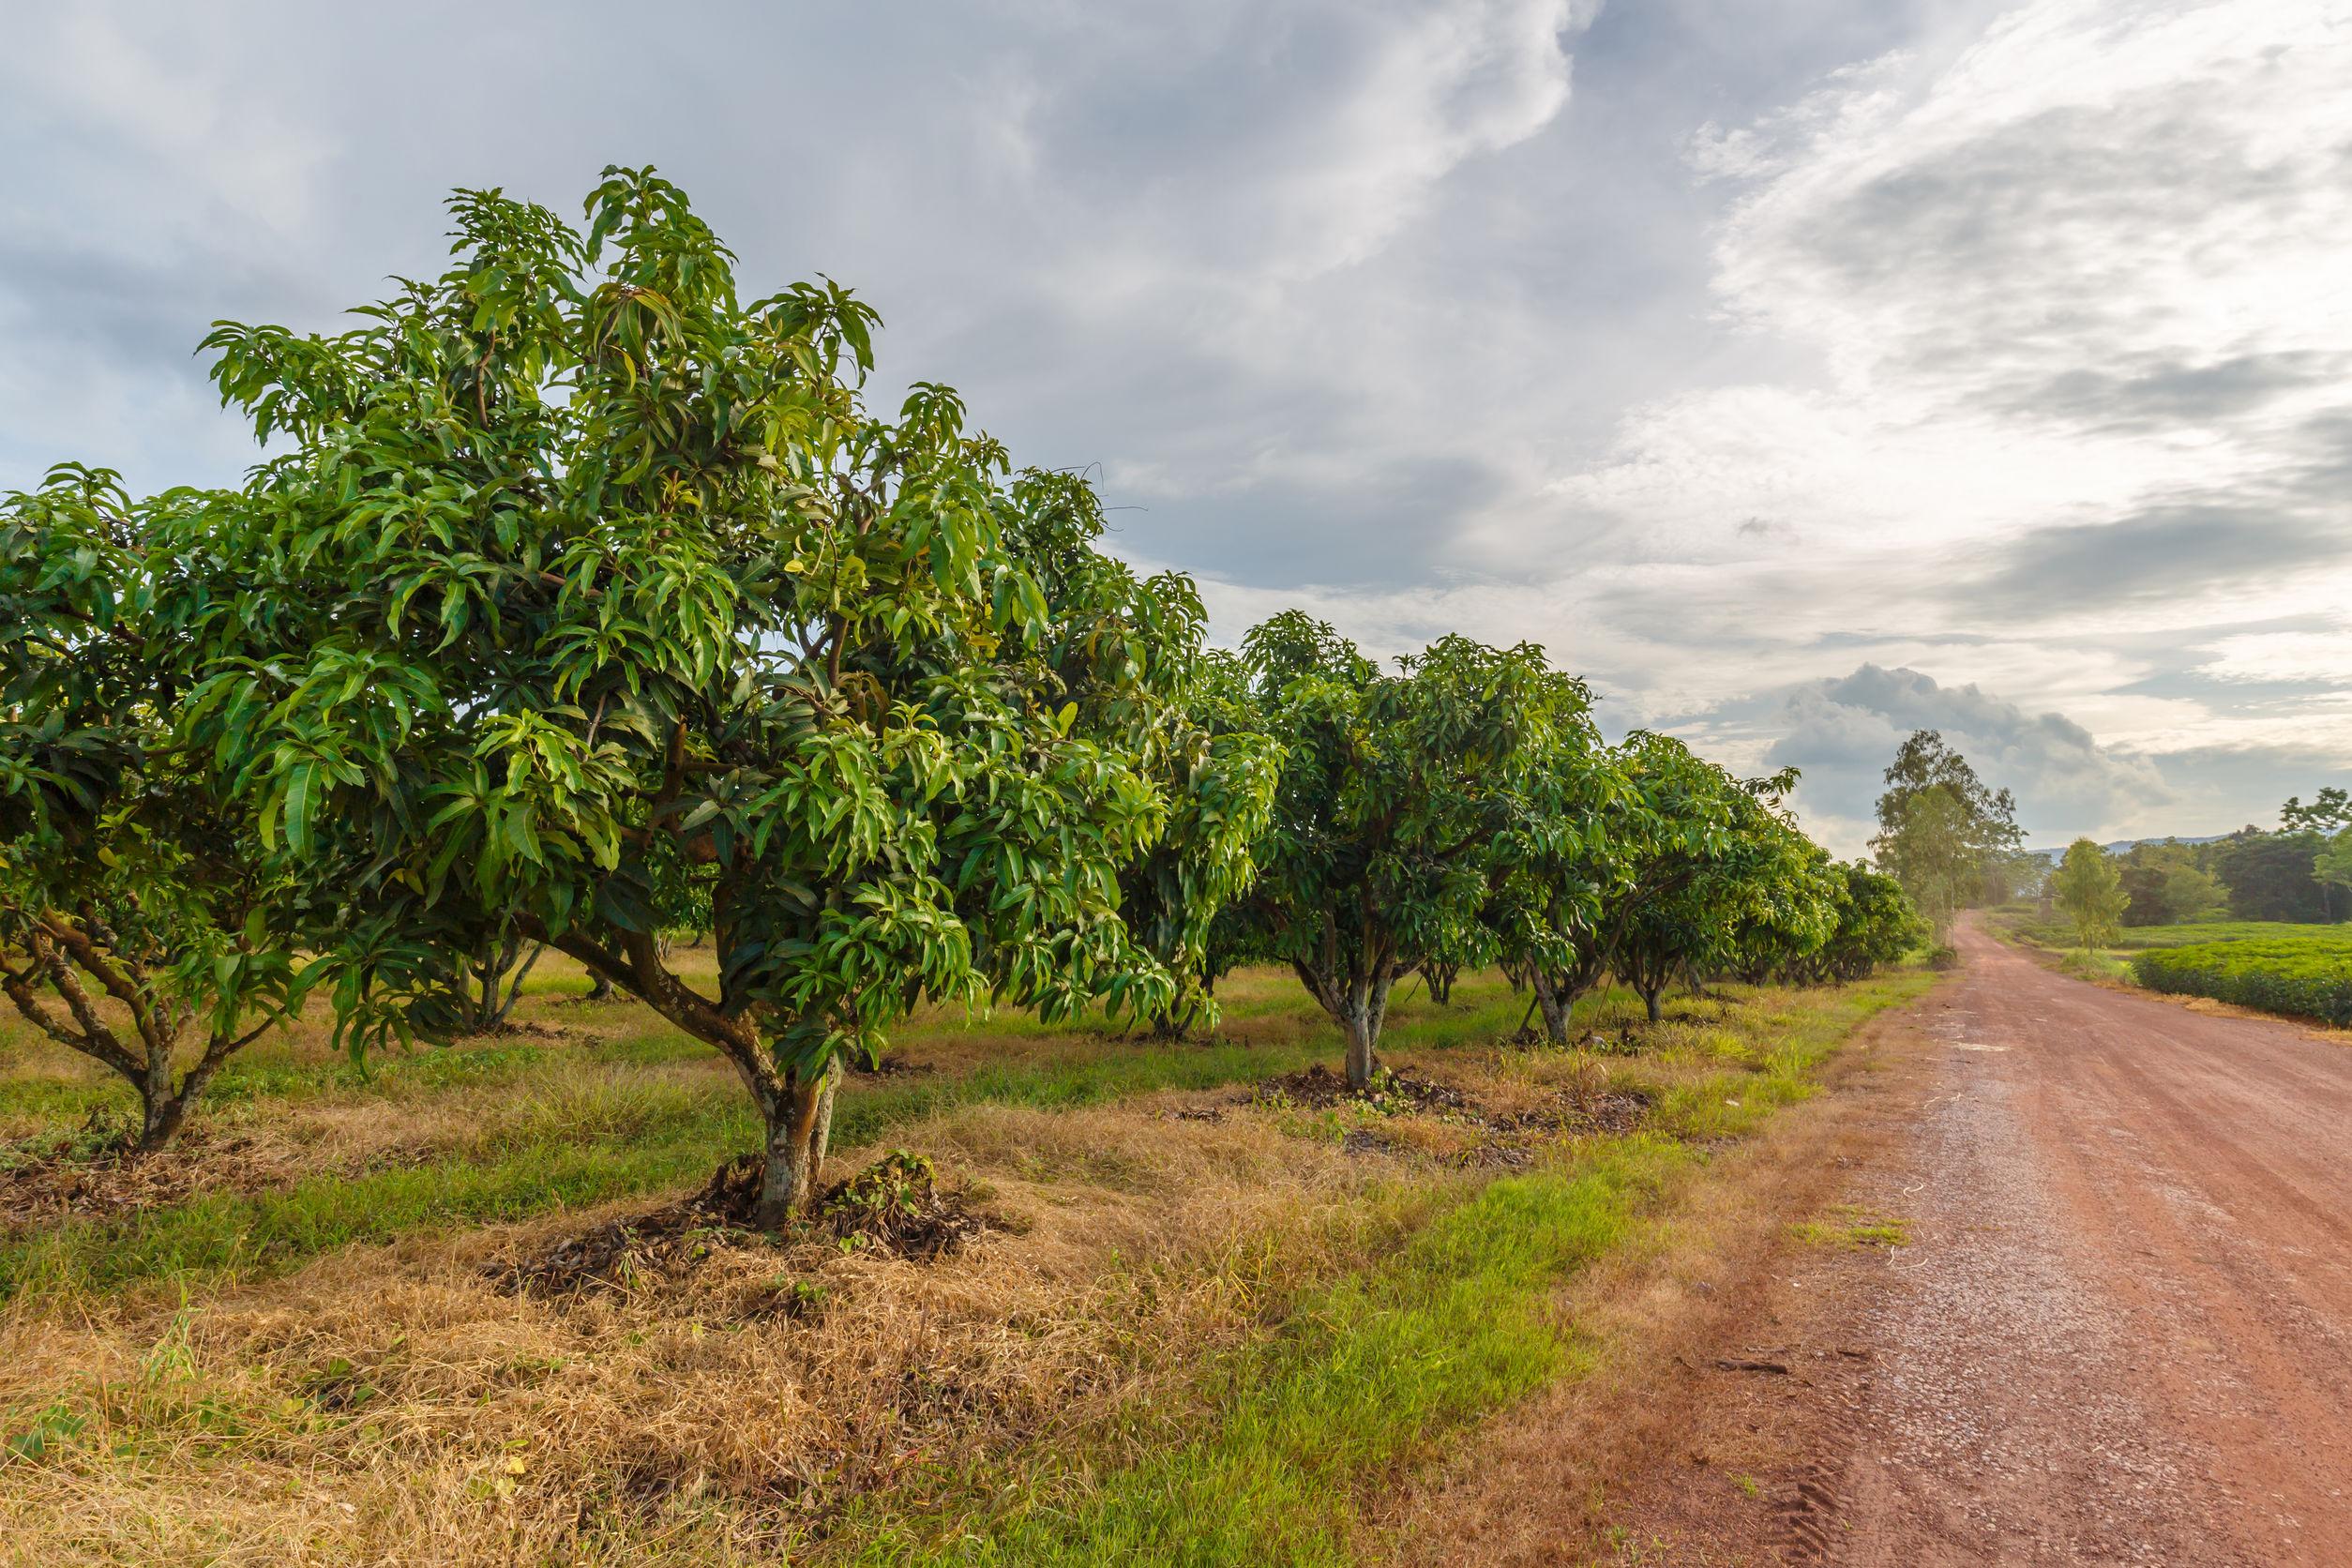 Mango farm at Noen Maprang, Phitsanulok, countryside of Thailand